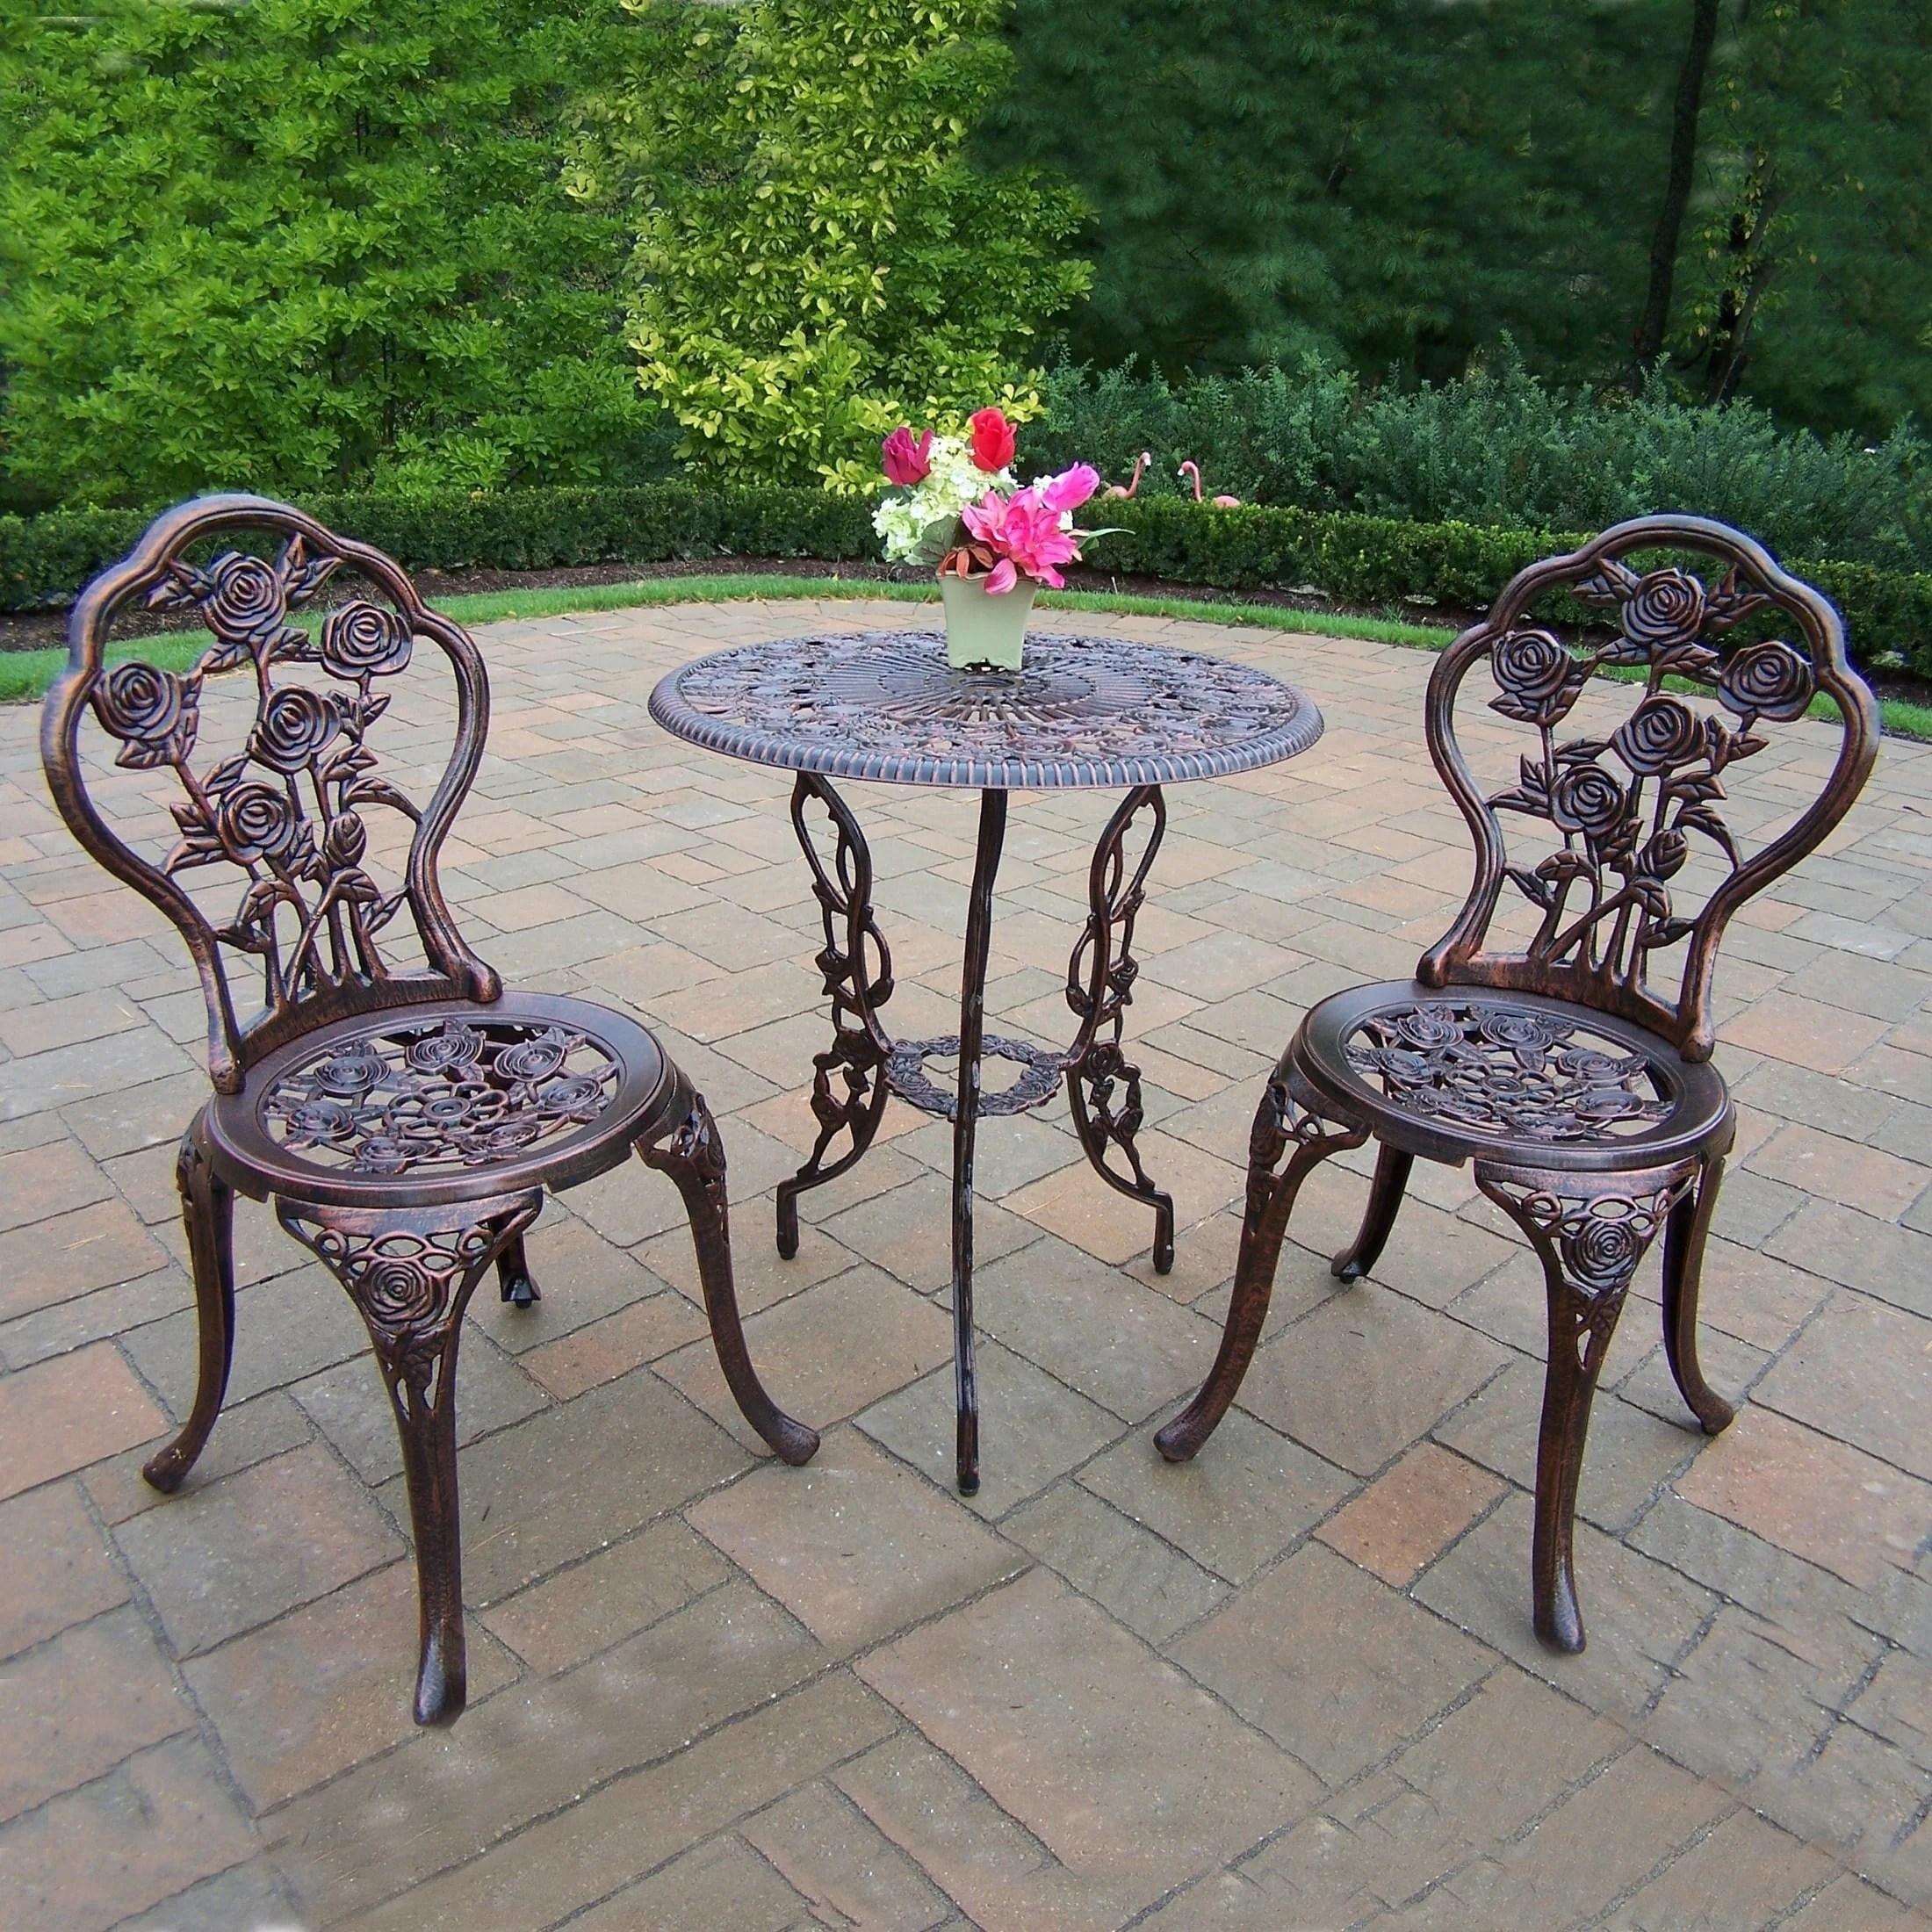 outdoor patio furniture 3pcs cast